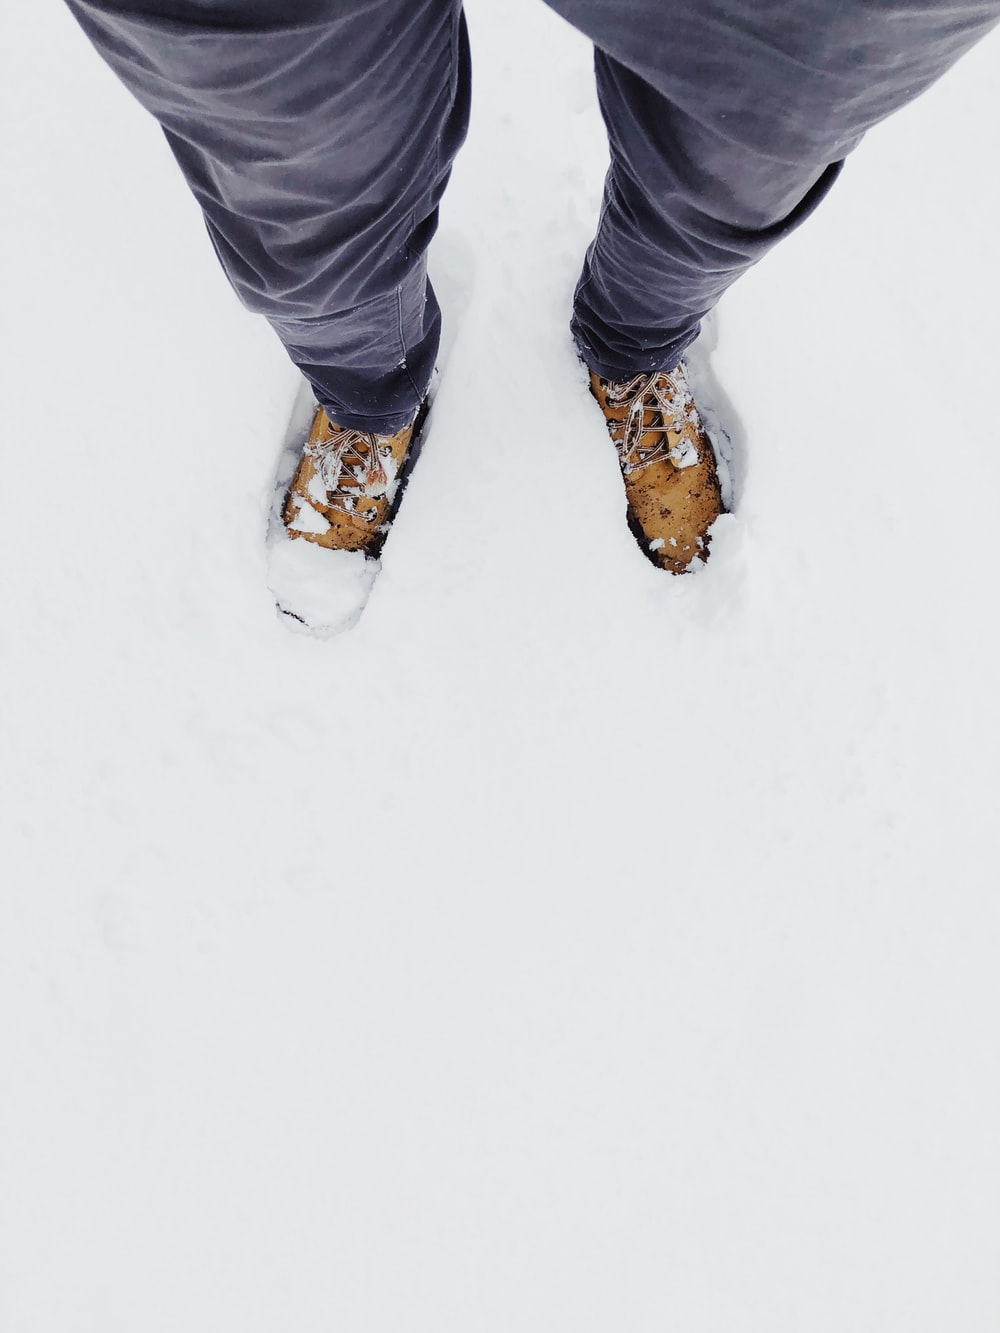 man standing on snow field